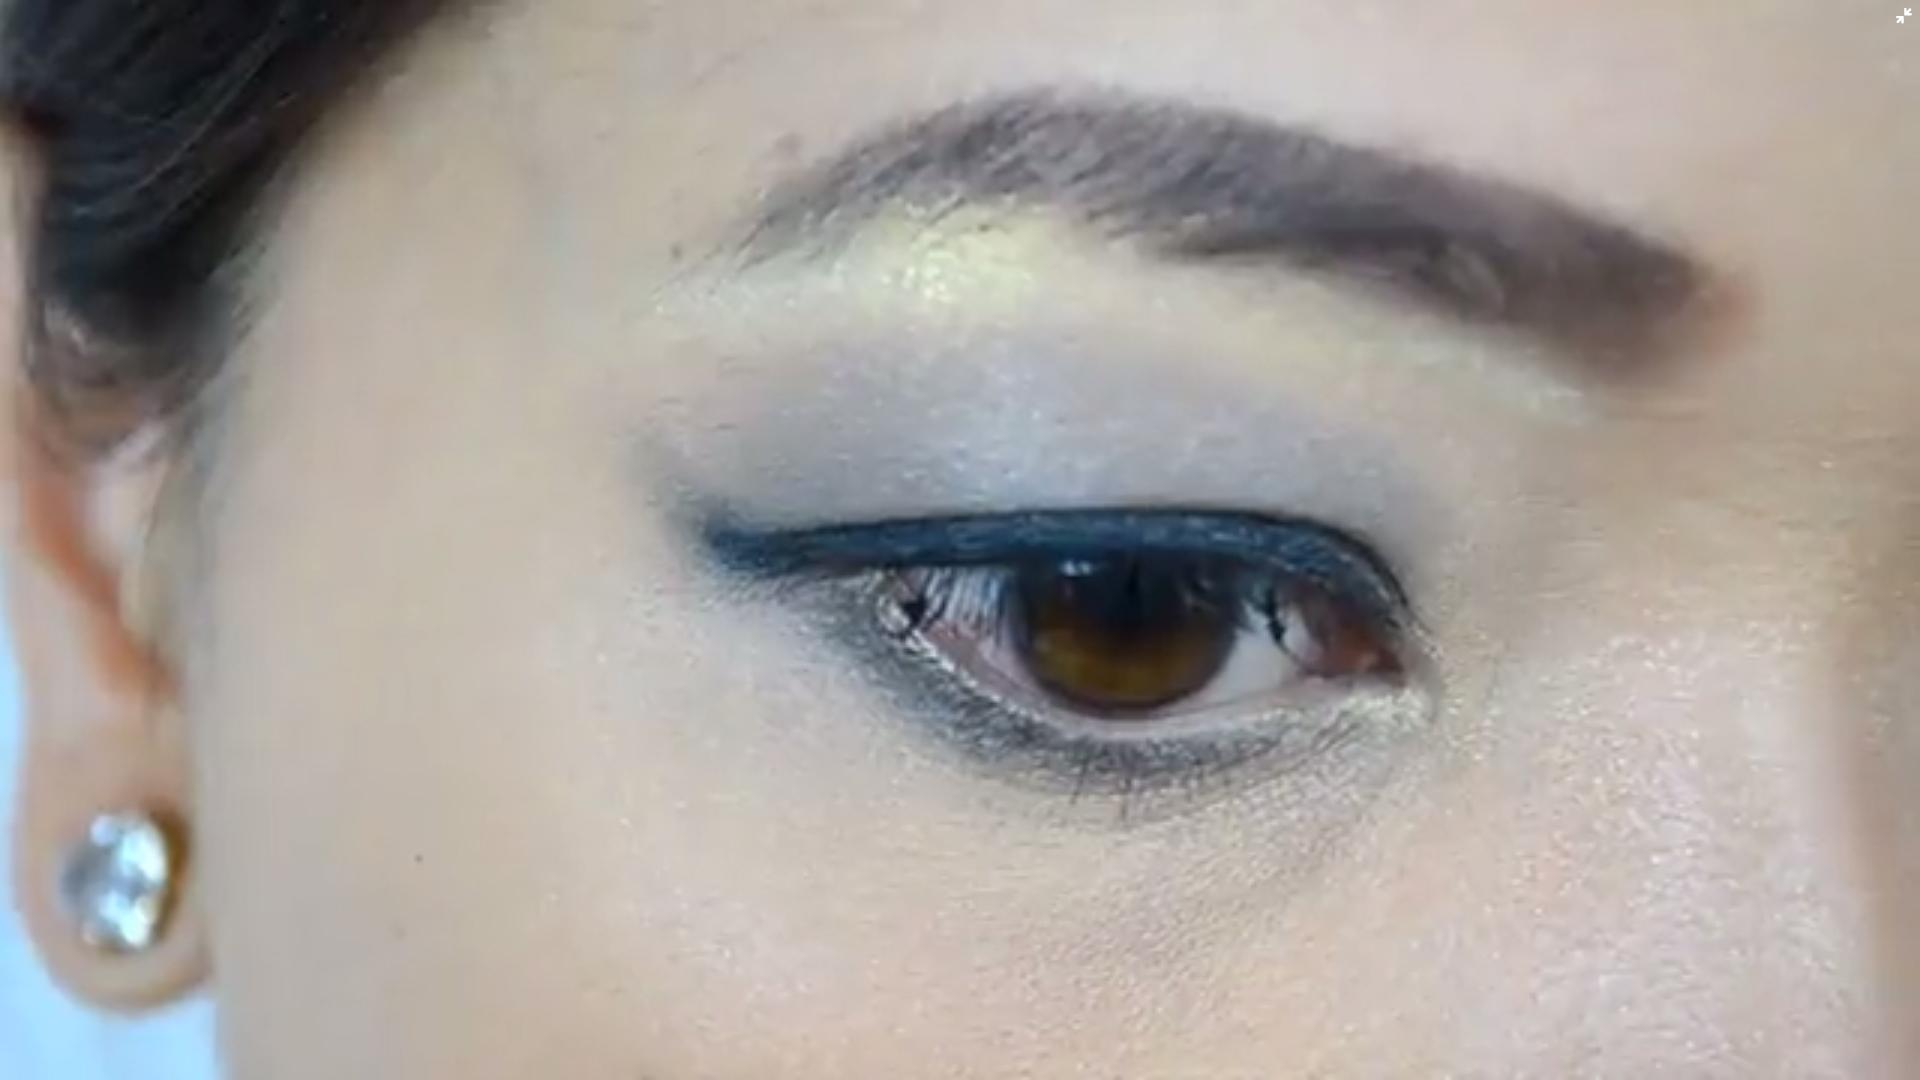 Макияж смоки айс (smoky eyes) - шаг 3/8